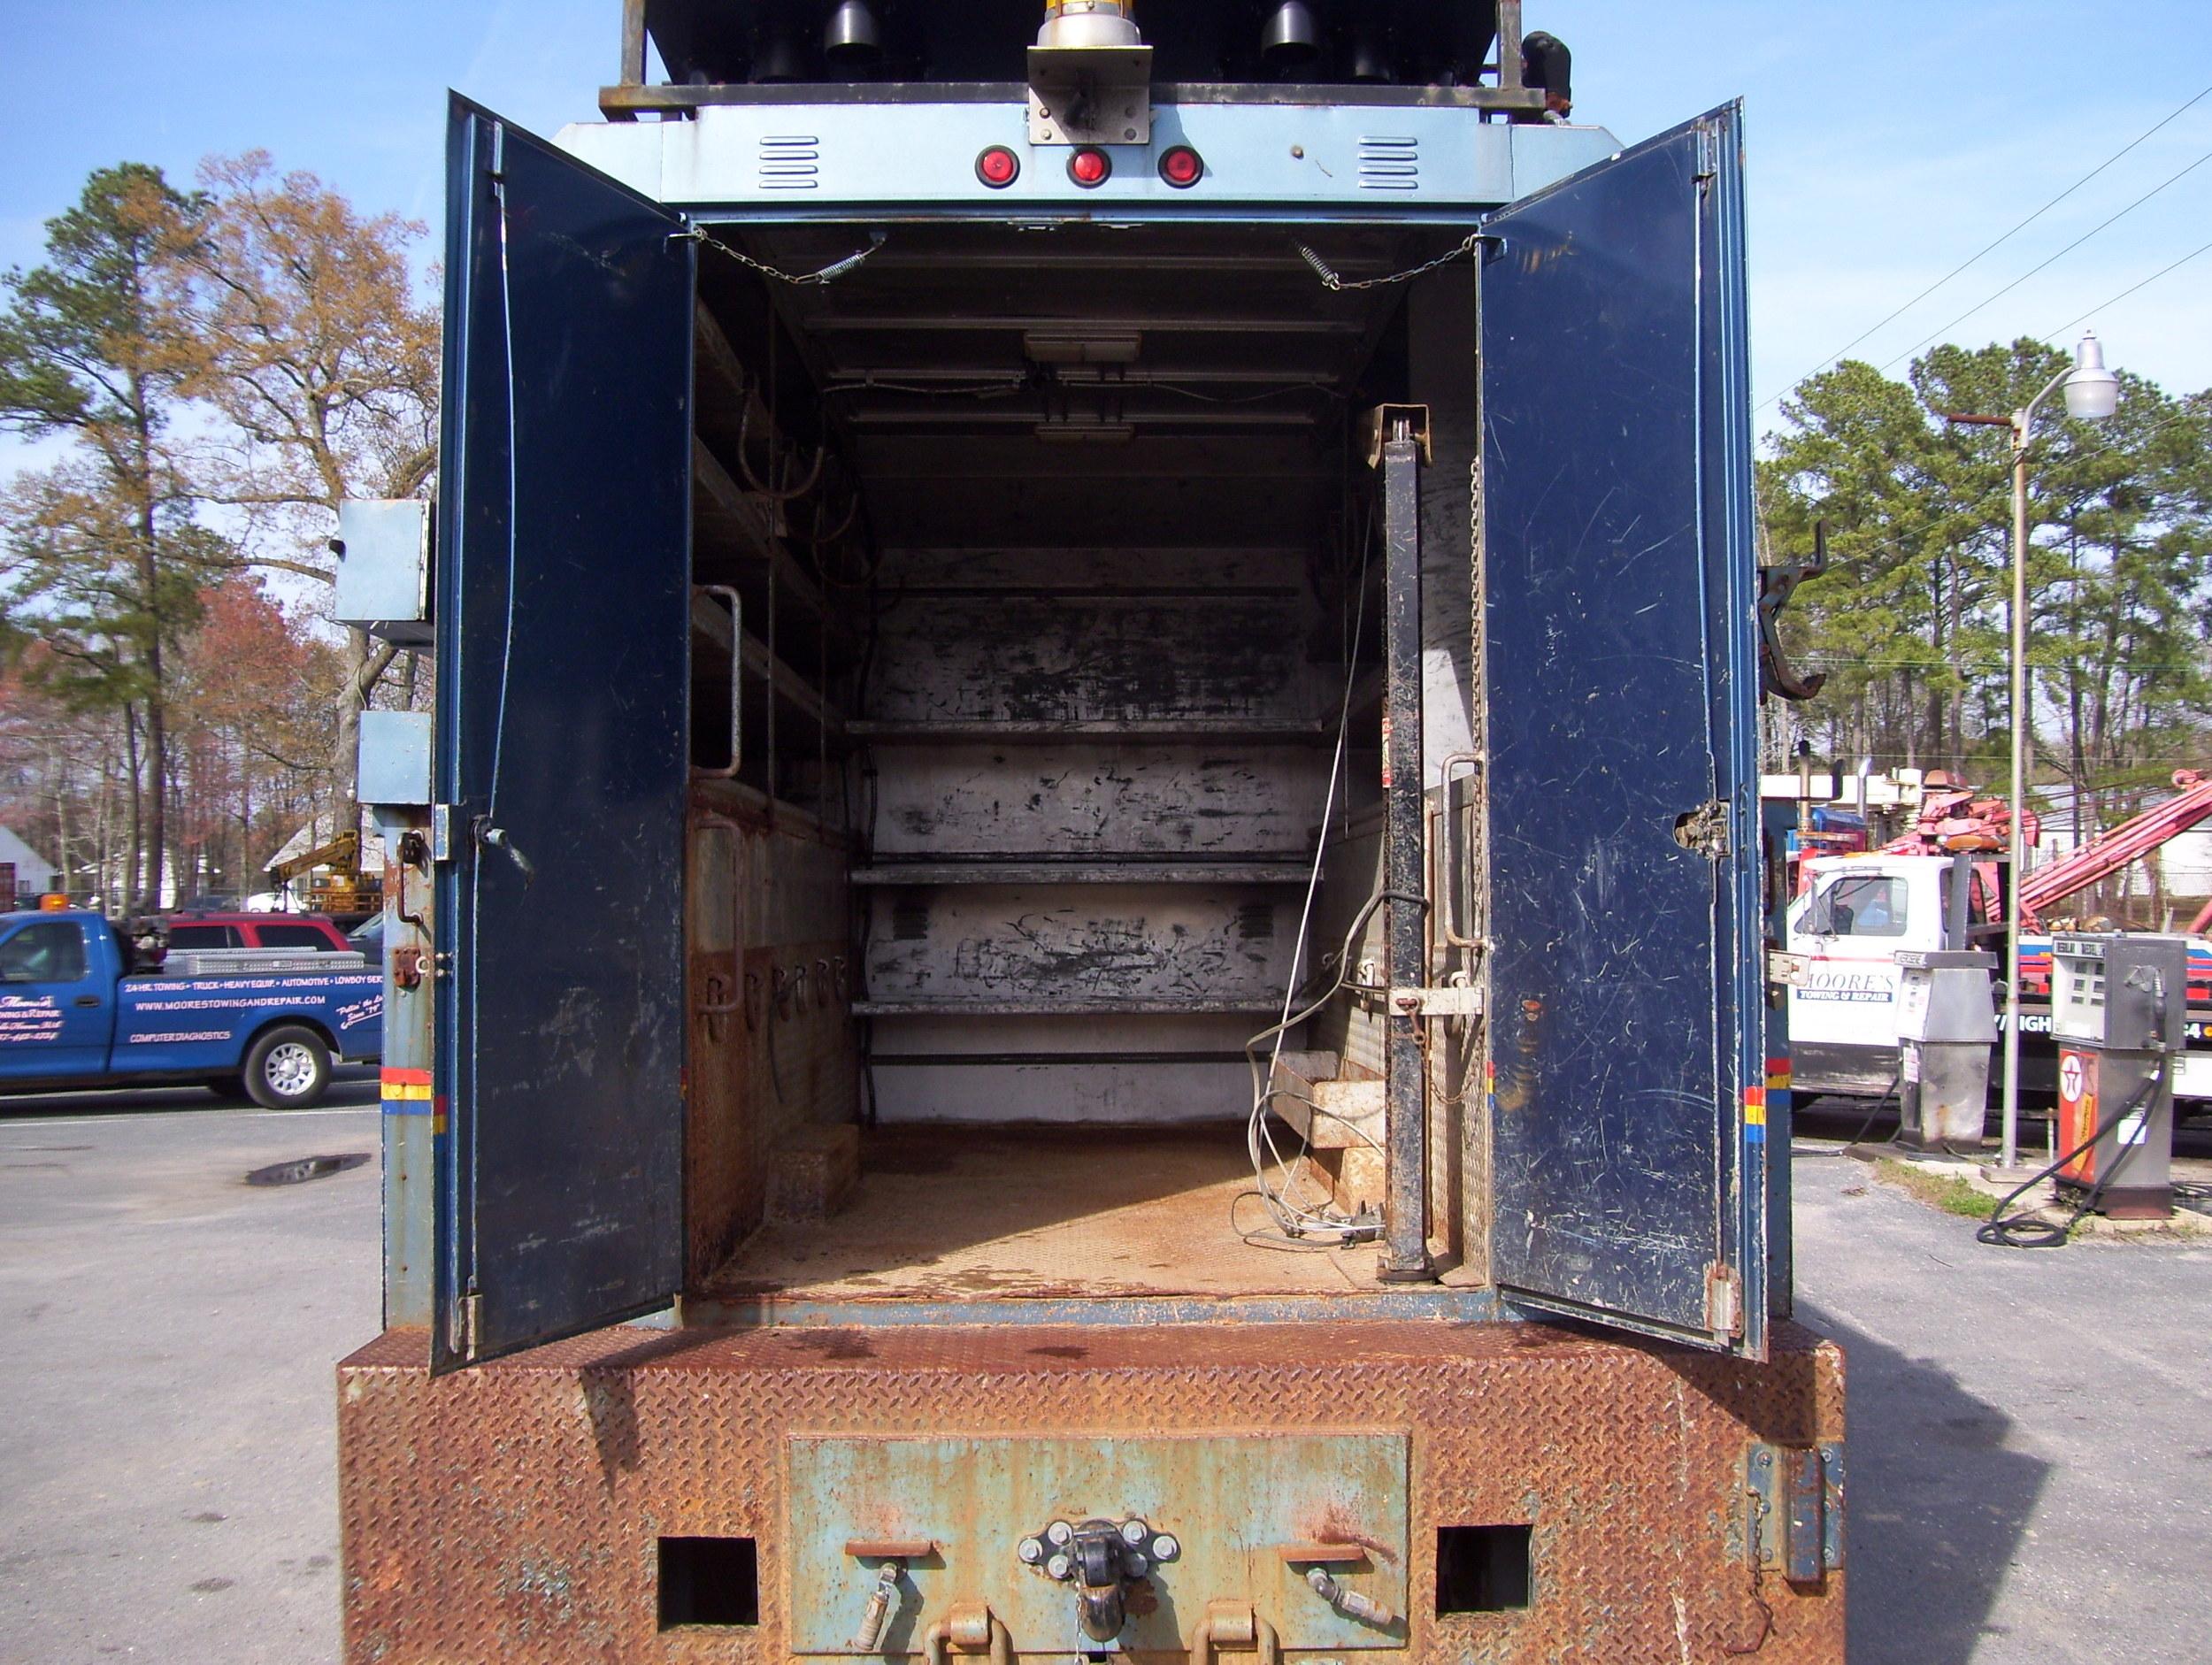 99 International Service Truck 005.jpg